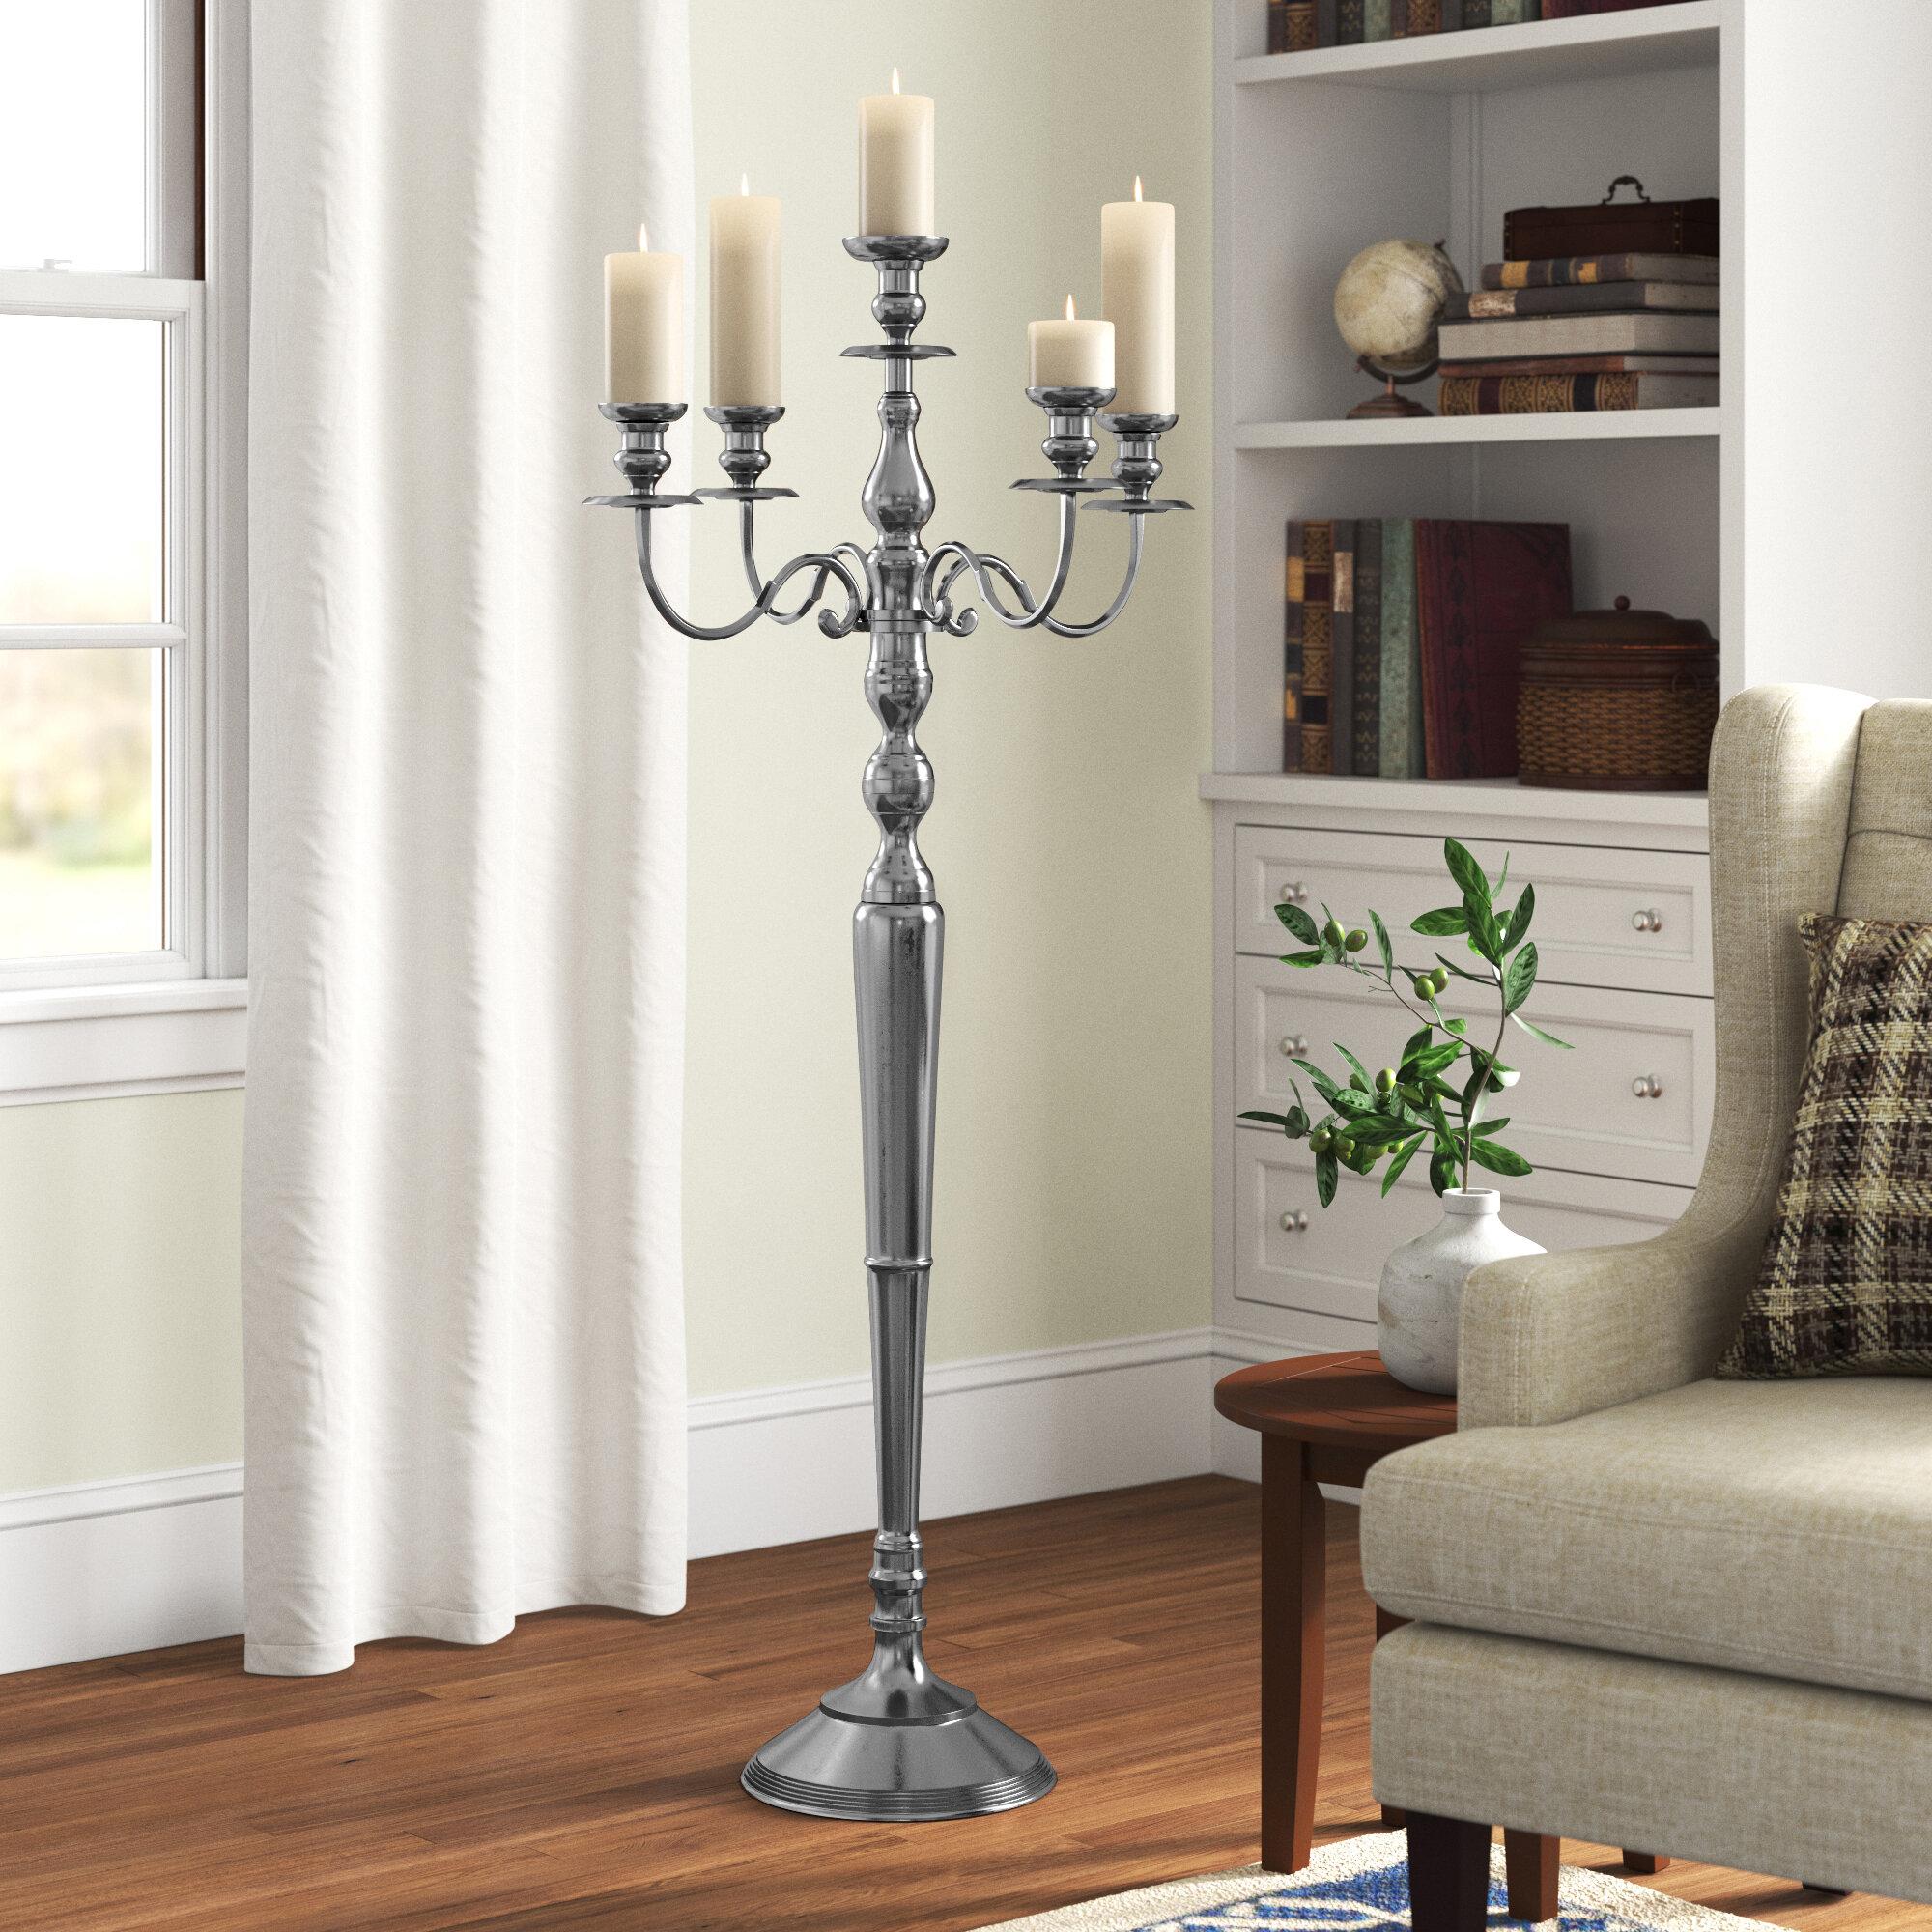 Candelabra Candle Holders You Ll Love Wayfair Co Uk